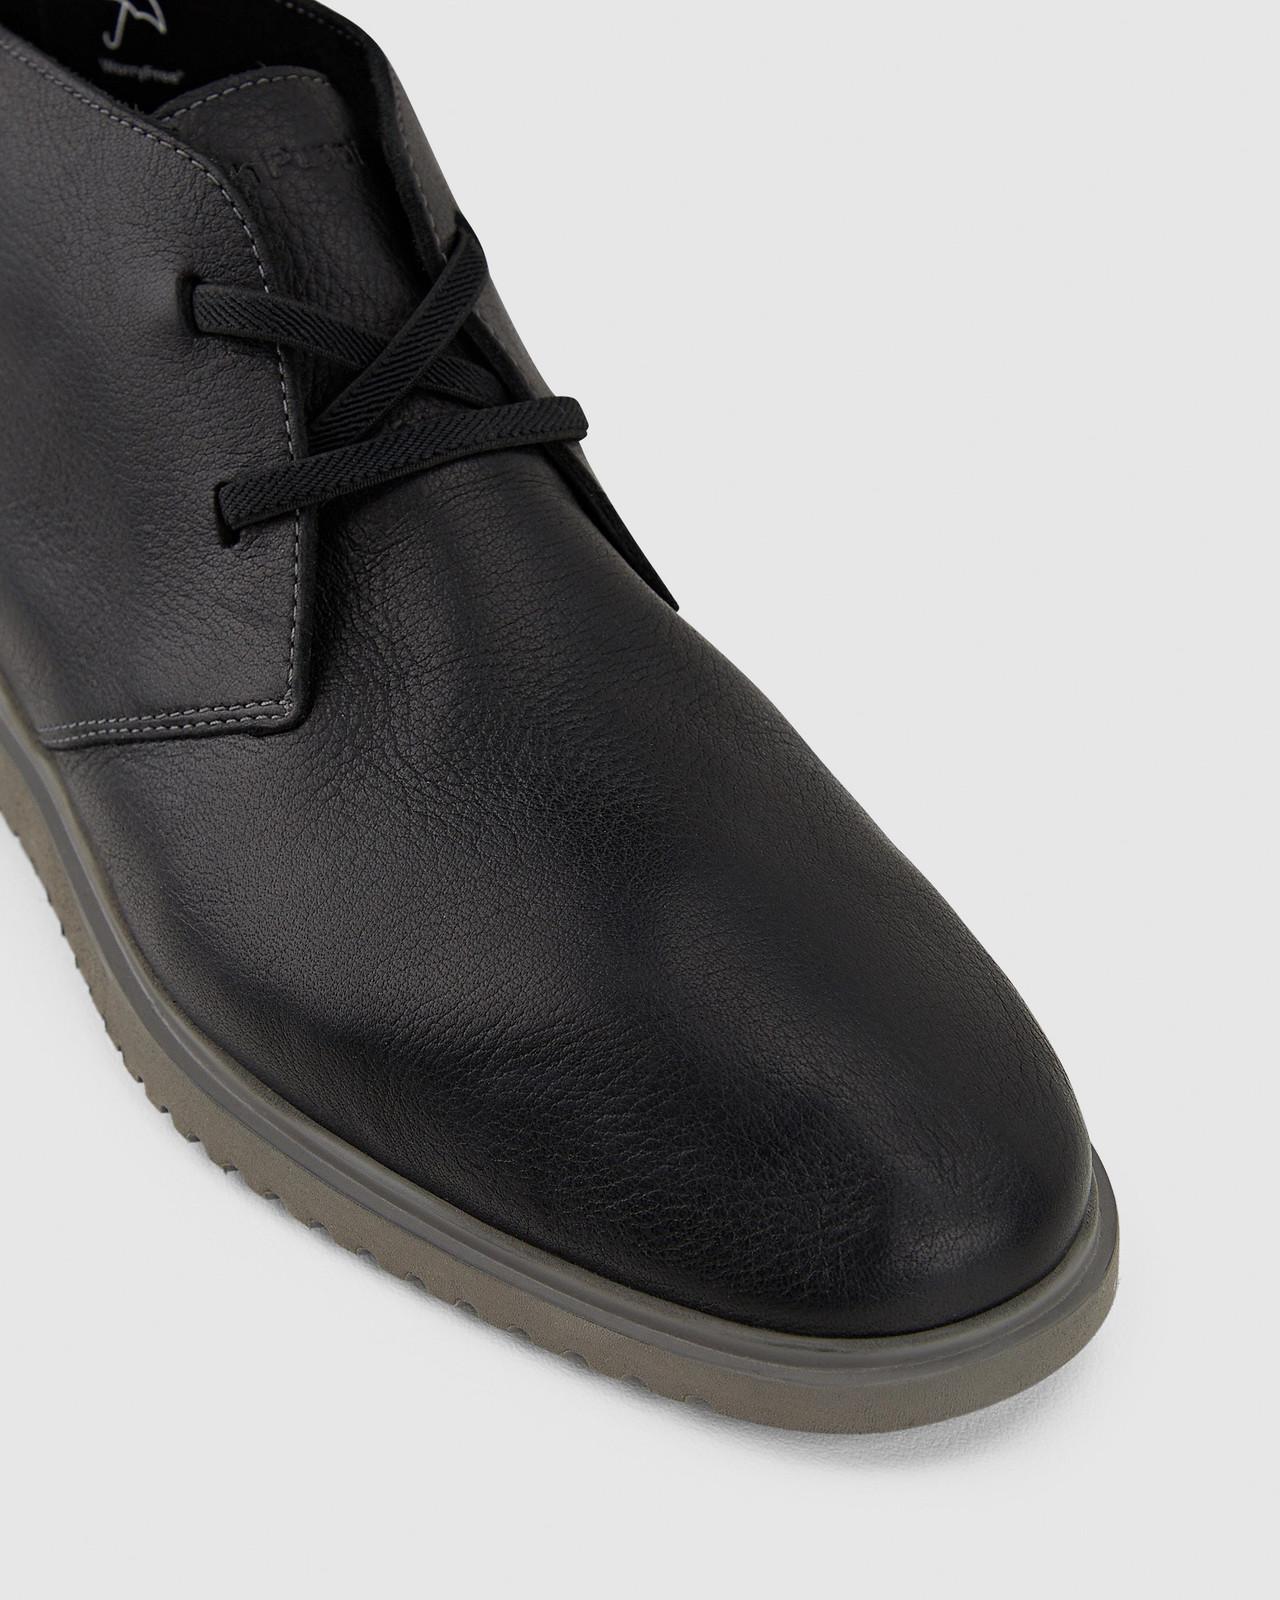 Hush Puppies  THE EVERYDAY CHUKKA M Black Leather